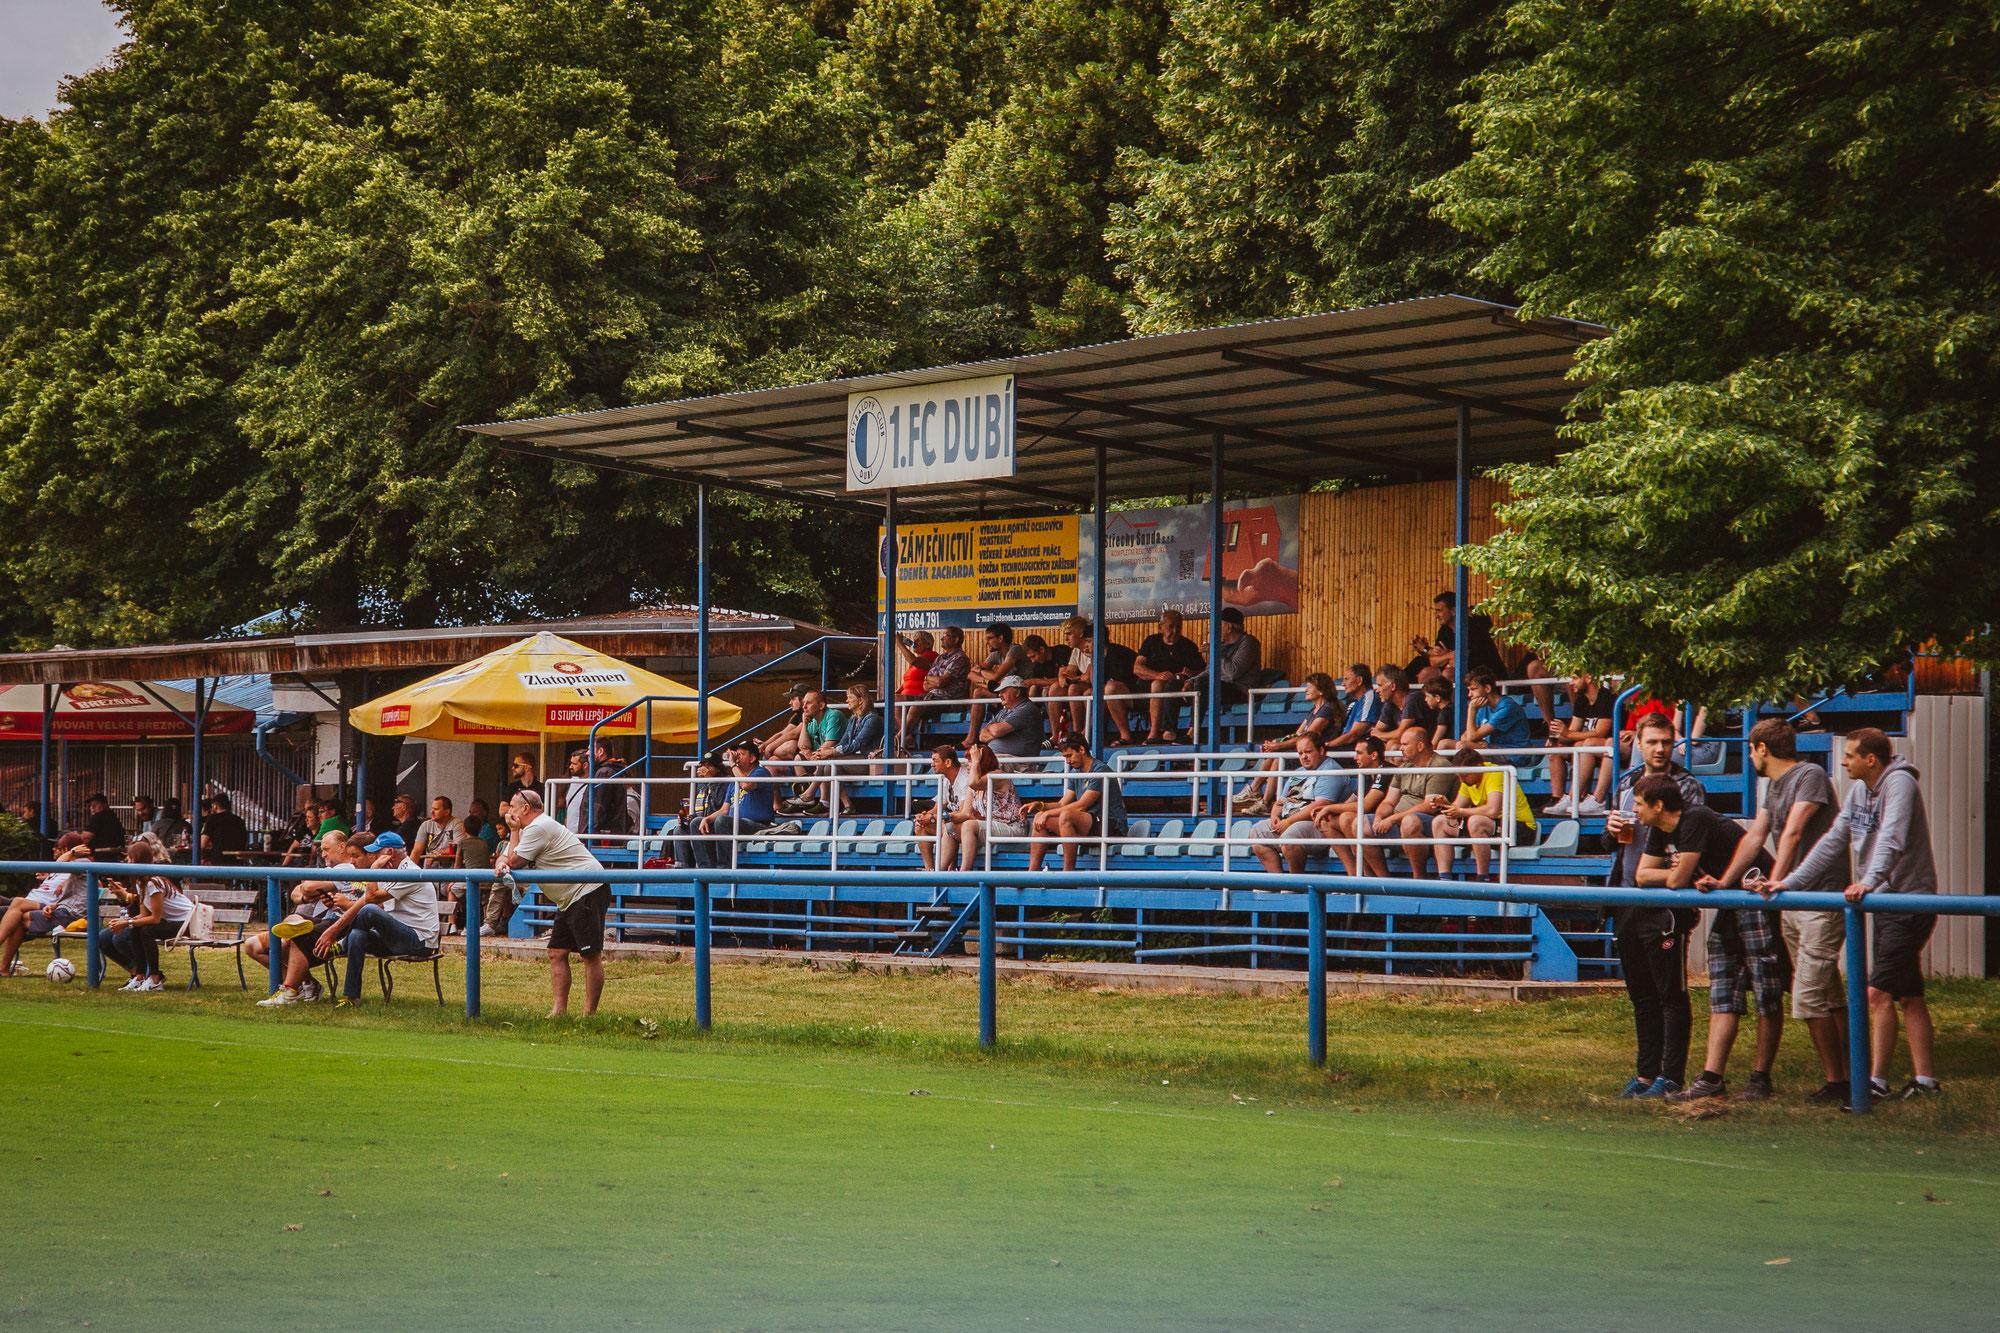 Groundhopping: FK Teplice vs. FC Chomutov